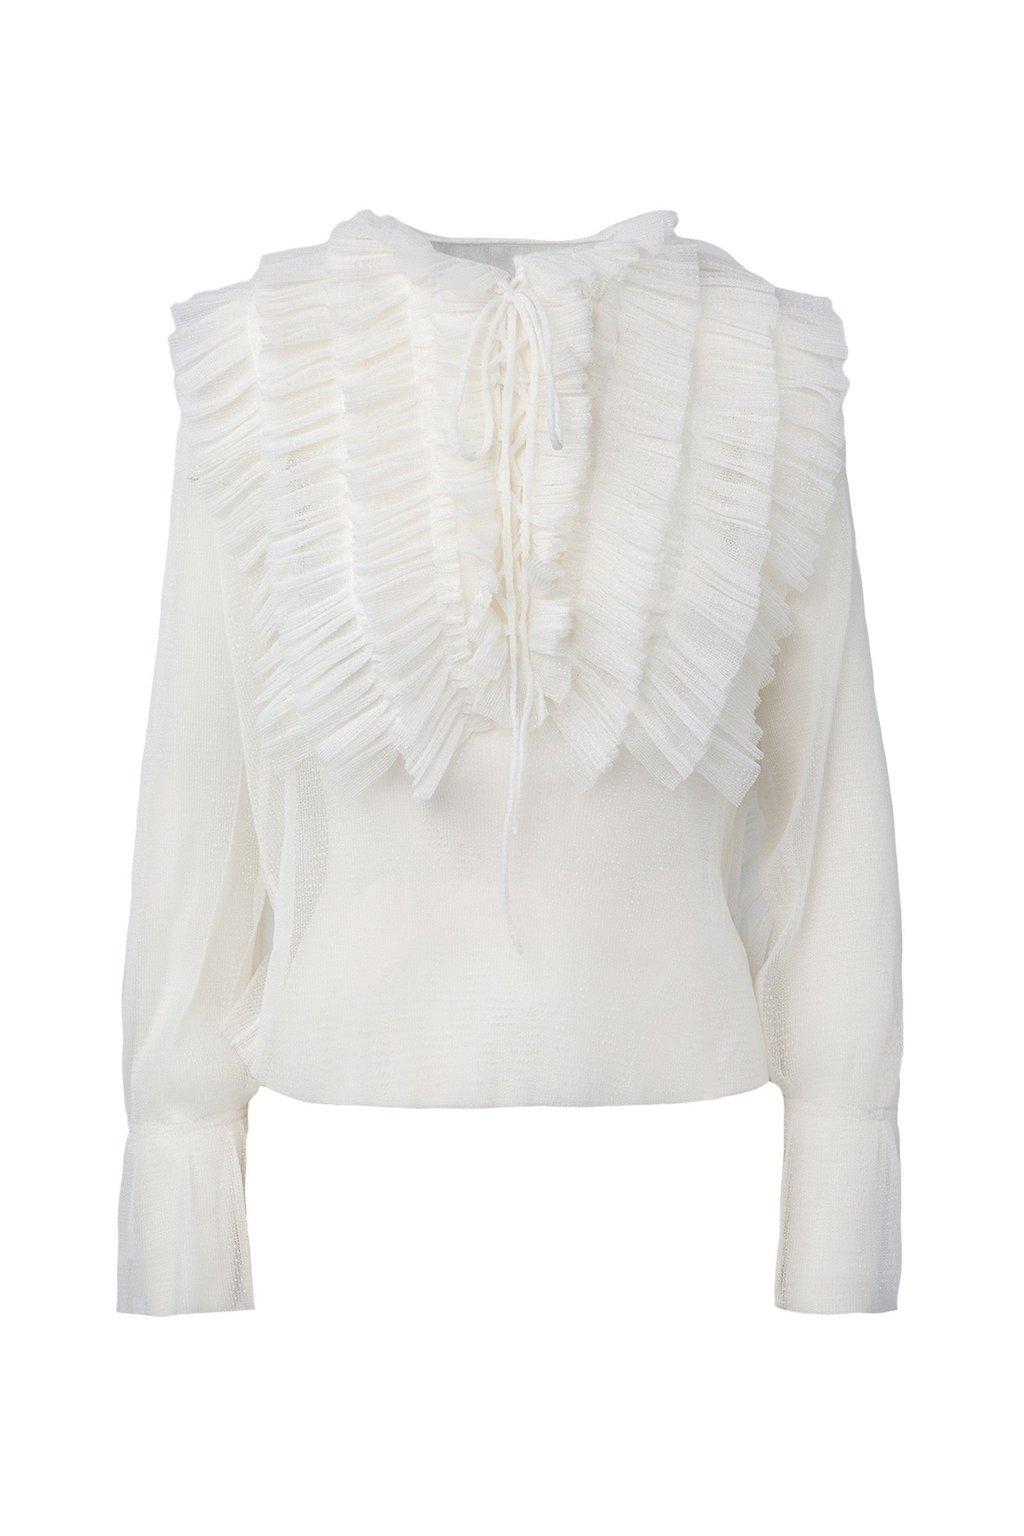 Lex Blouse by J.ING women's clothing